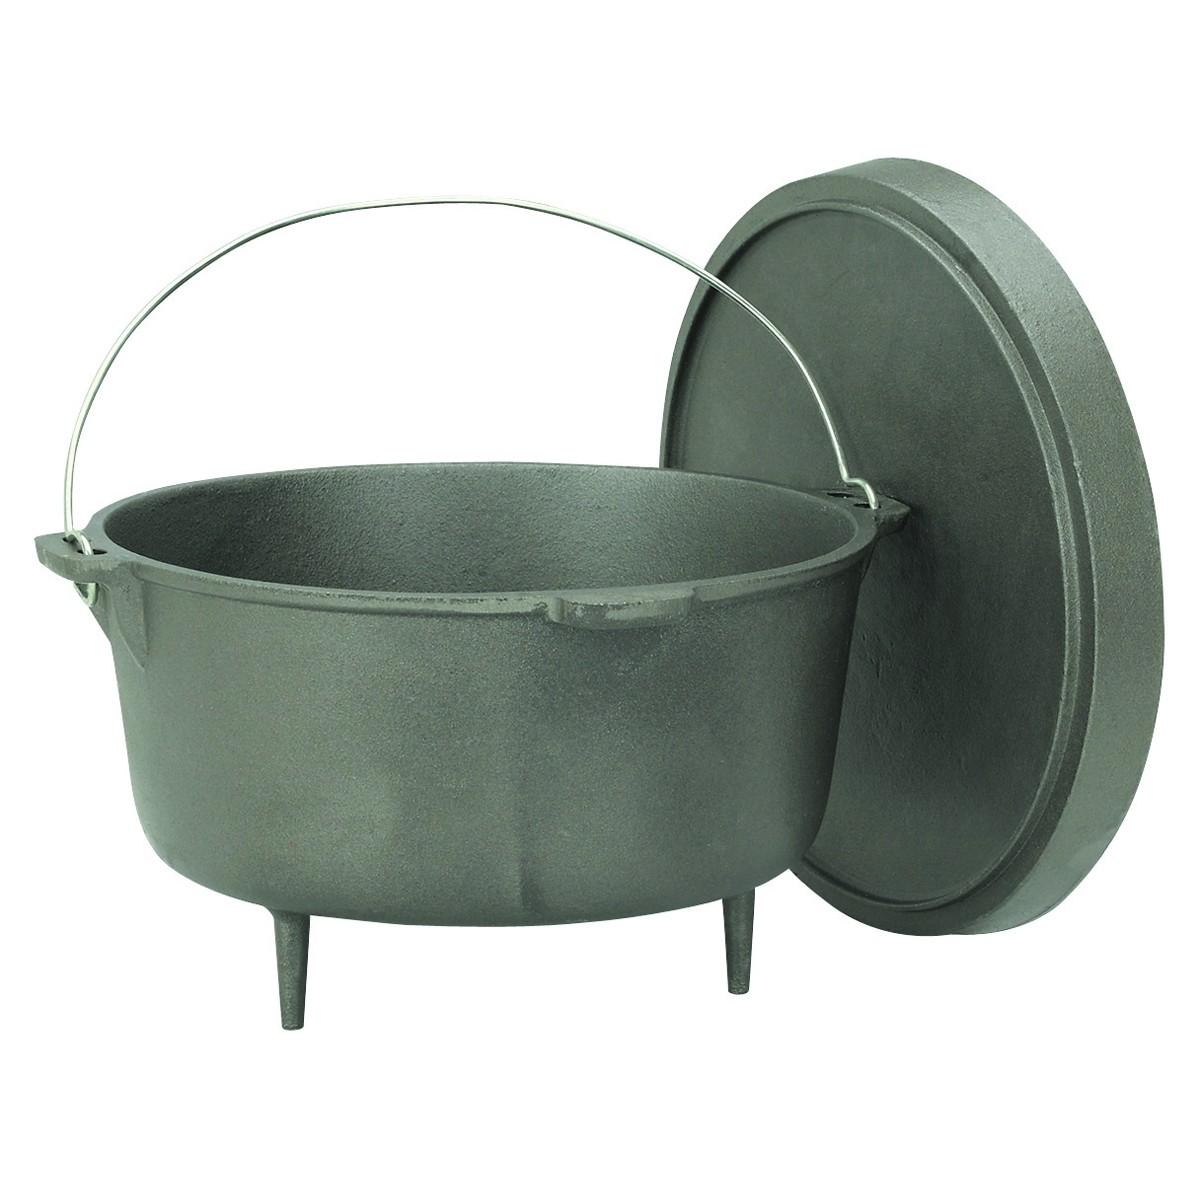 Wholesale China Manufacturer Color Enamel Cast Iron Round Dutch Oven